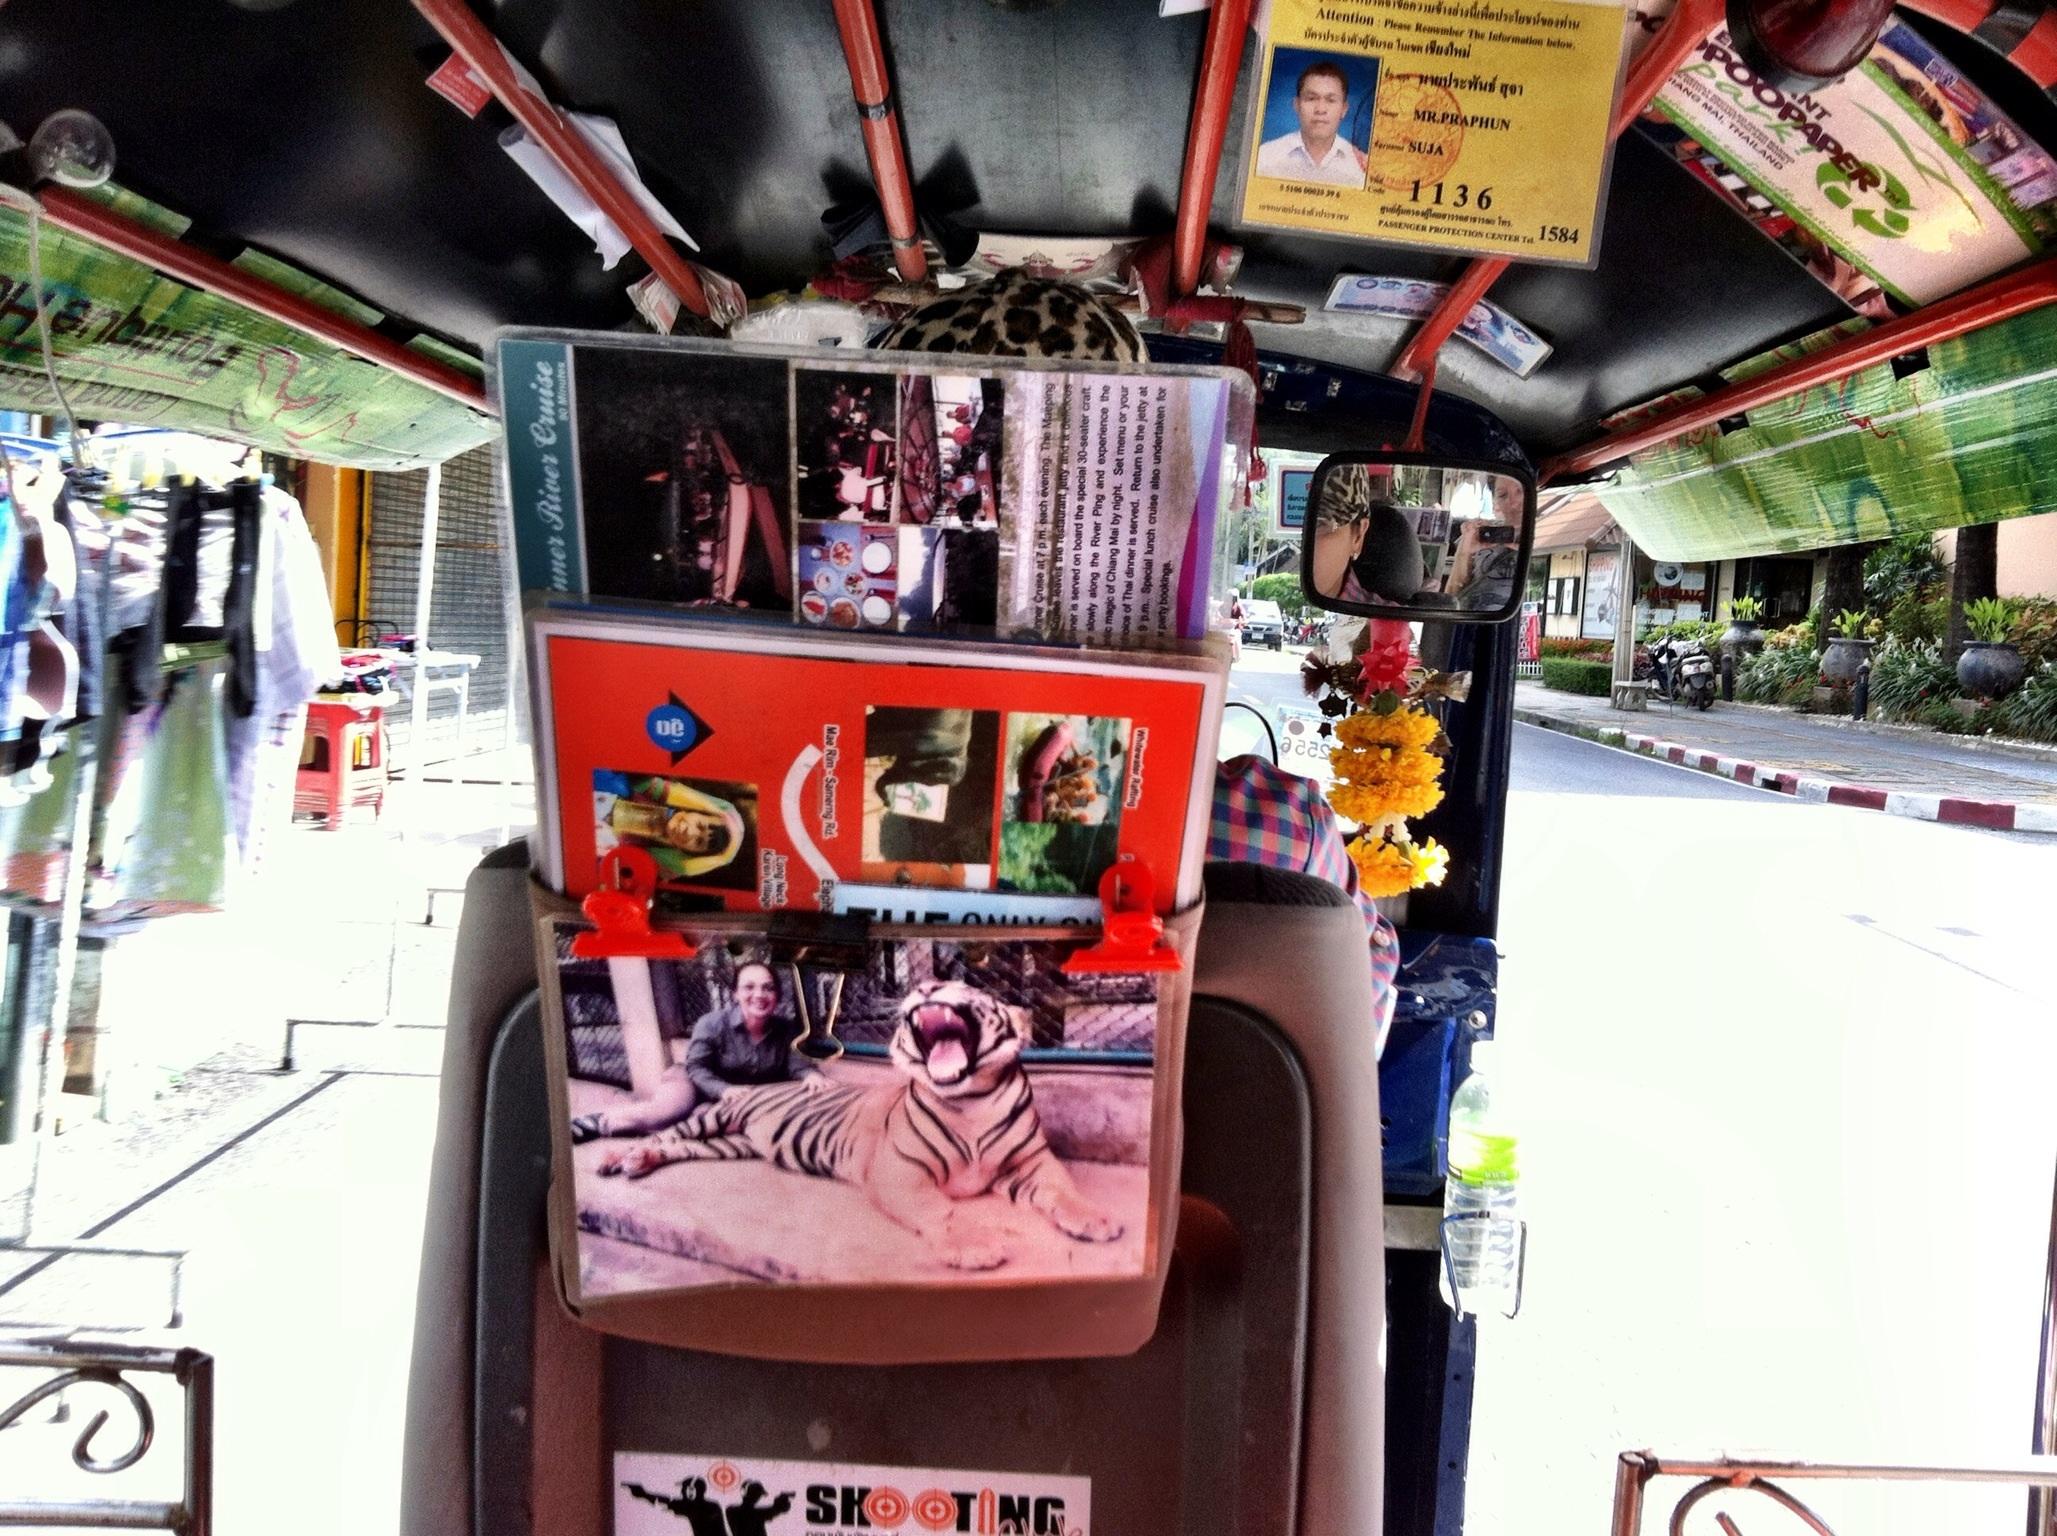 Chiang Mai πρακτορείο γνωριμιών dating με μαύρους στο γυμνάσιο